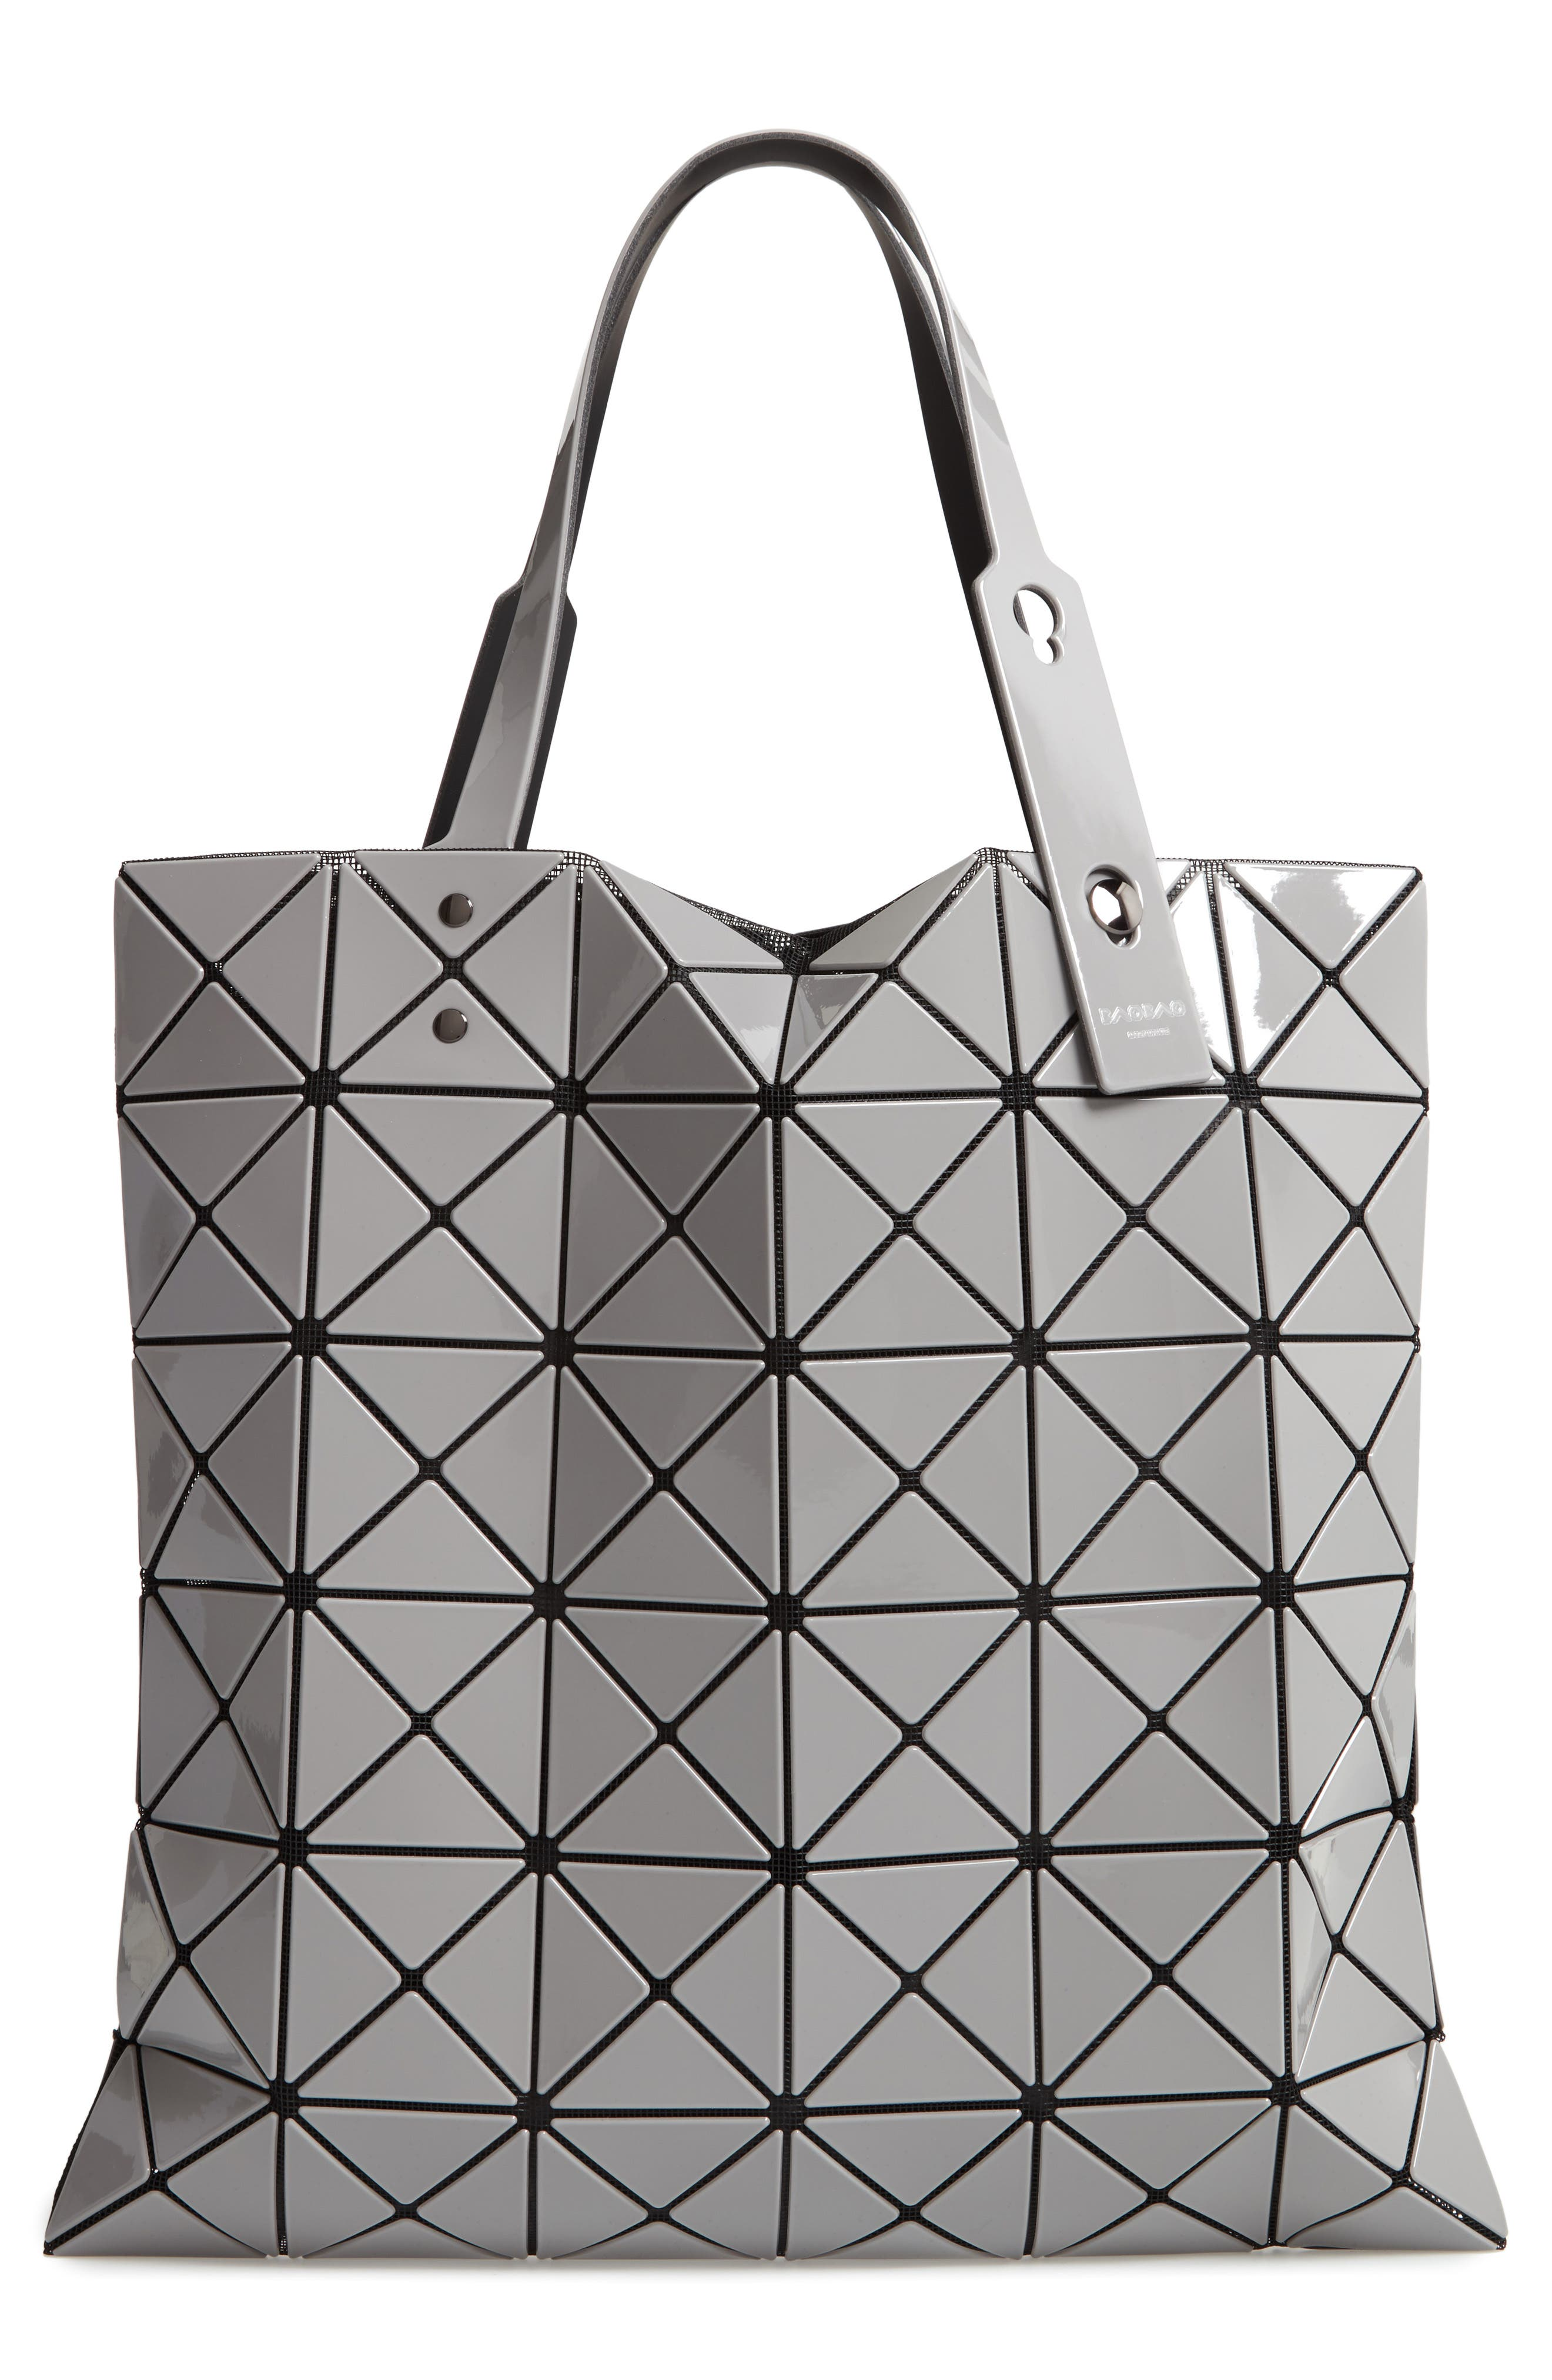 BAO BAO ISSEY MIYAKE Lucent Two-Tone Tote Bag, Main, color, 020